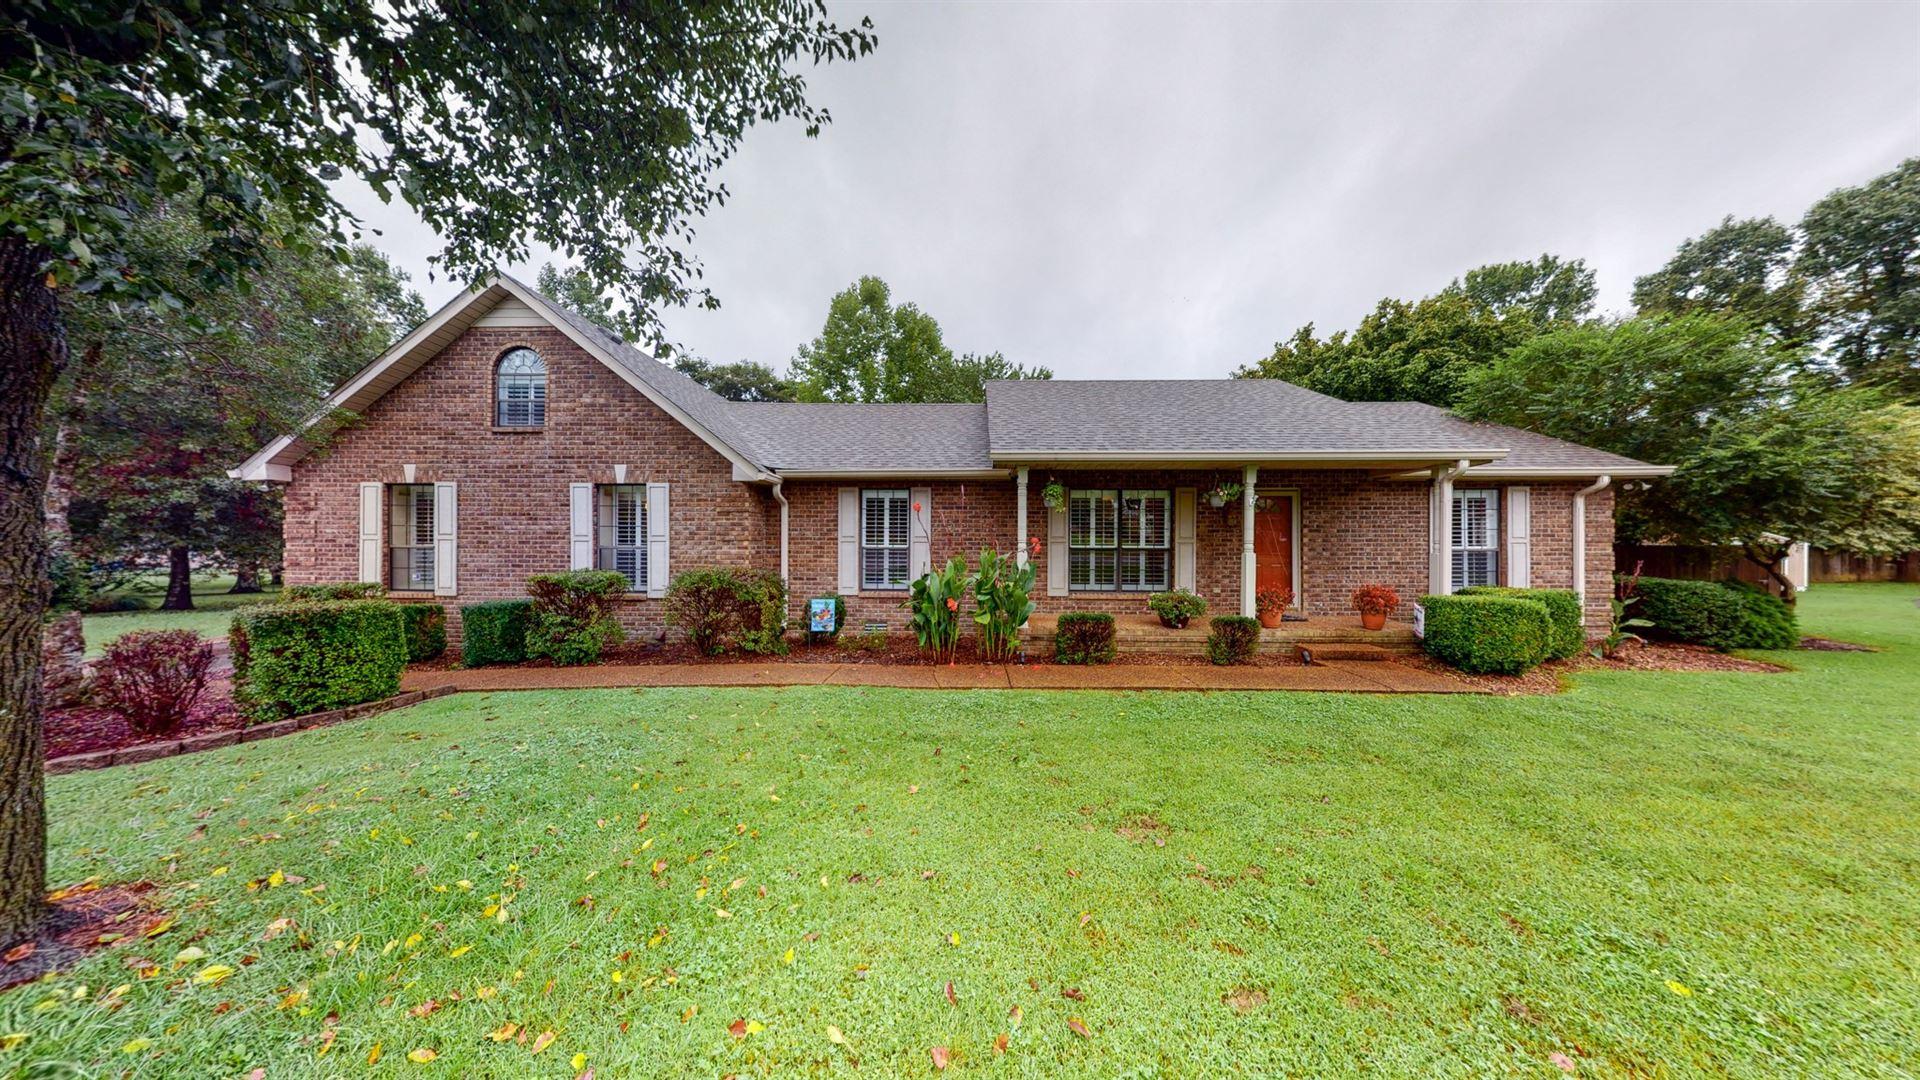 306 Carlton Pl, Goodlettsville, TN 37072 - MLS#: 2293394